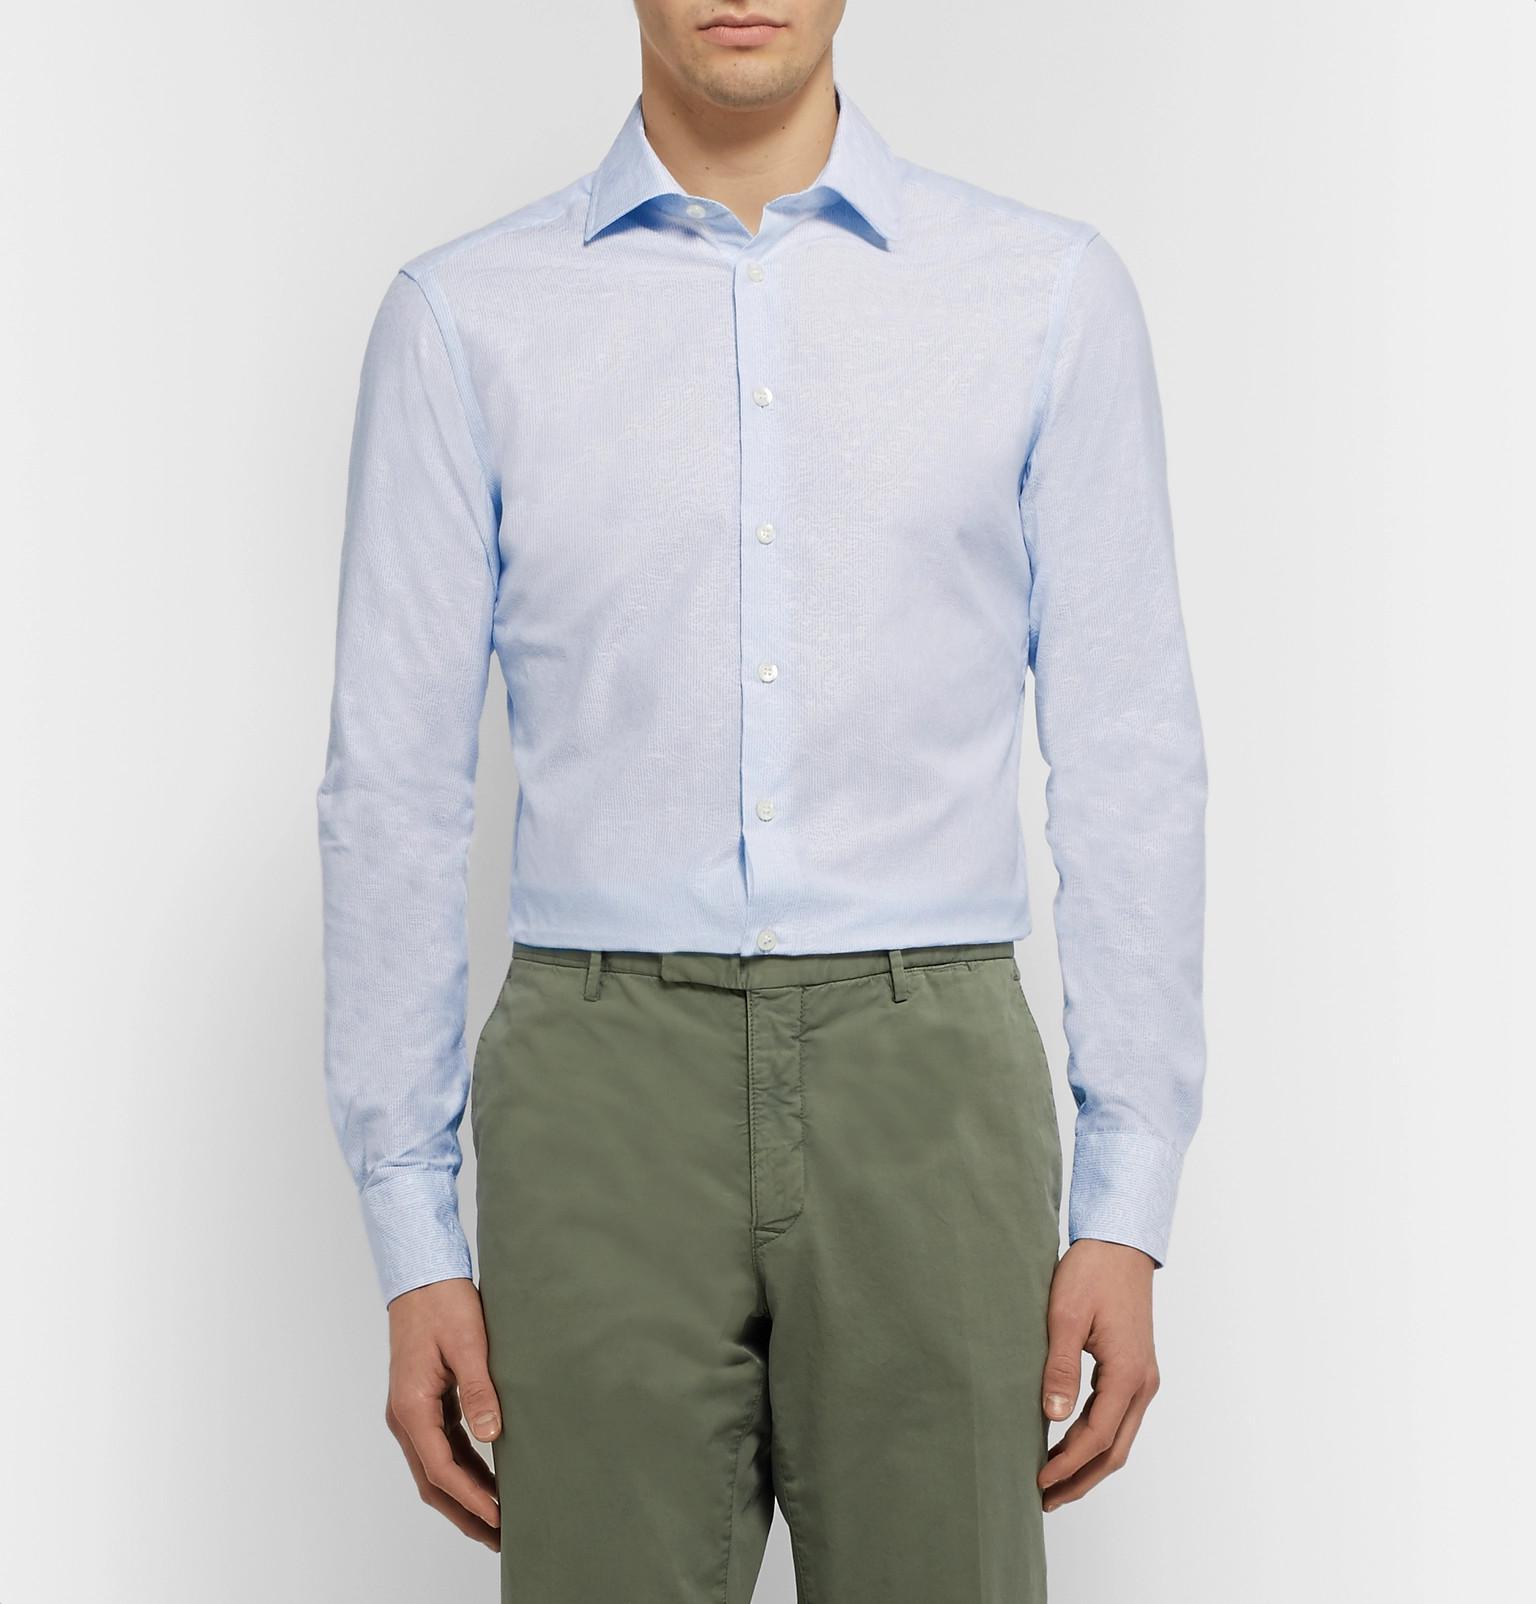 ec9e1338136 etro-blue-Light-blue-Slim-fit-Cutaway-collar-Striped-Cotton-jacquard-Shirt .jpeg